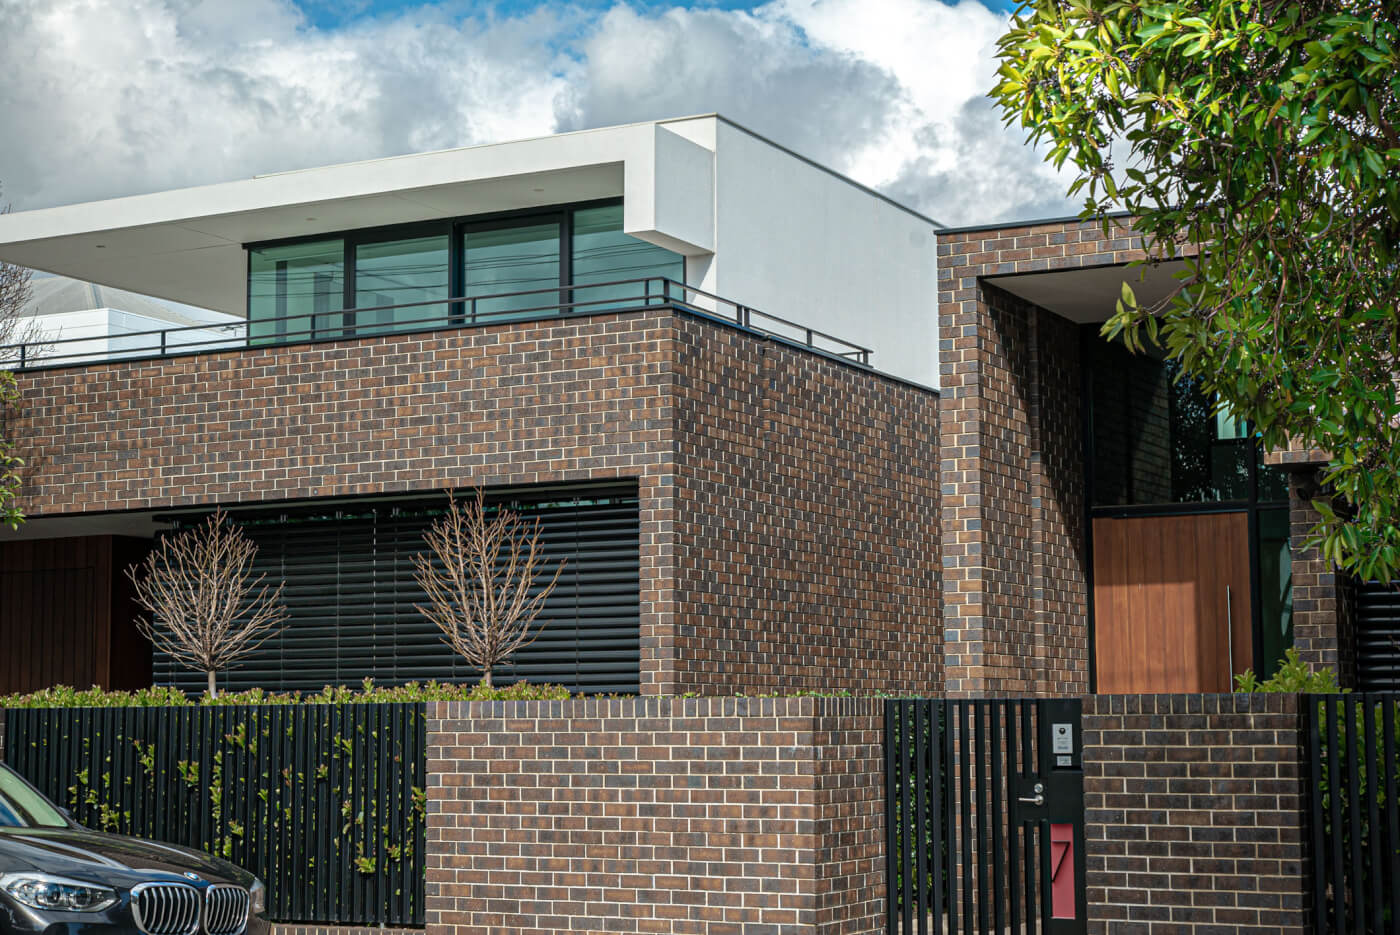 Coachhouse Brick 76mm Hyde Park Littlehampon Bricks And Pavers Reduced 6